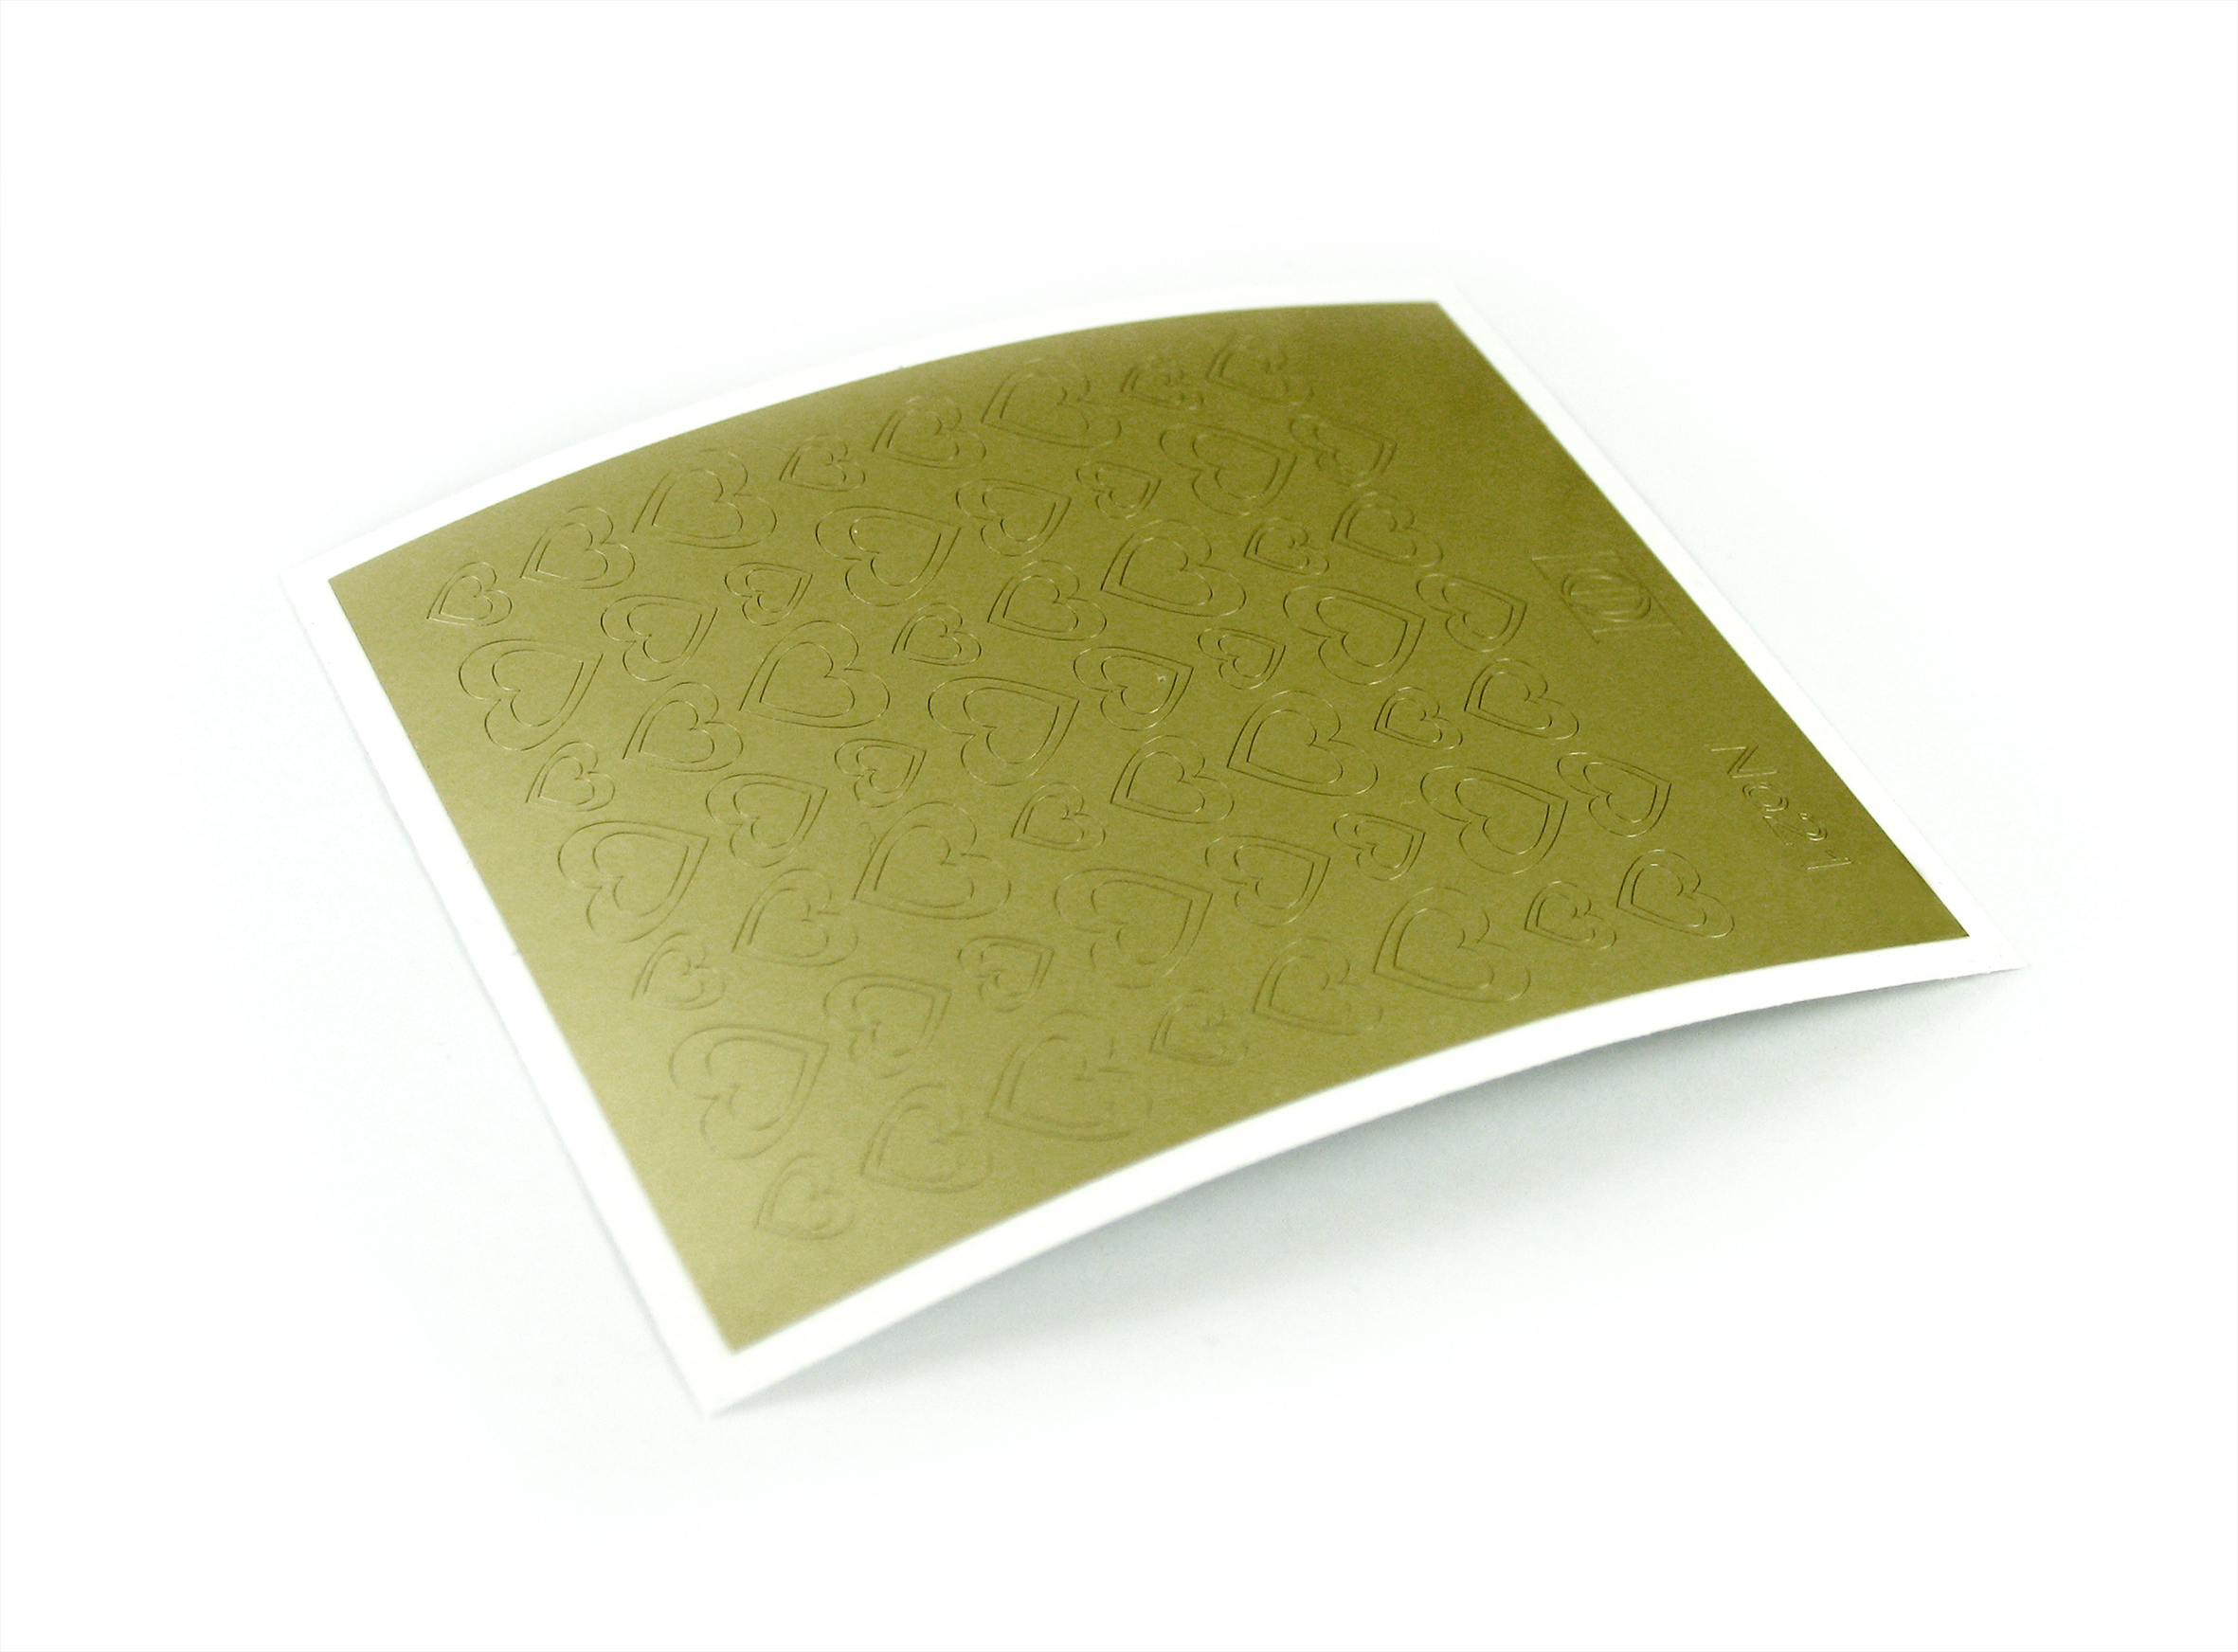 "Stiker pentru unghii ""Didier Lab"", Nr21, gold/Nail art sticker ""Didier lab"", No21, gold"